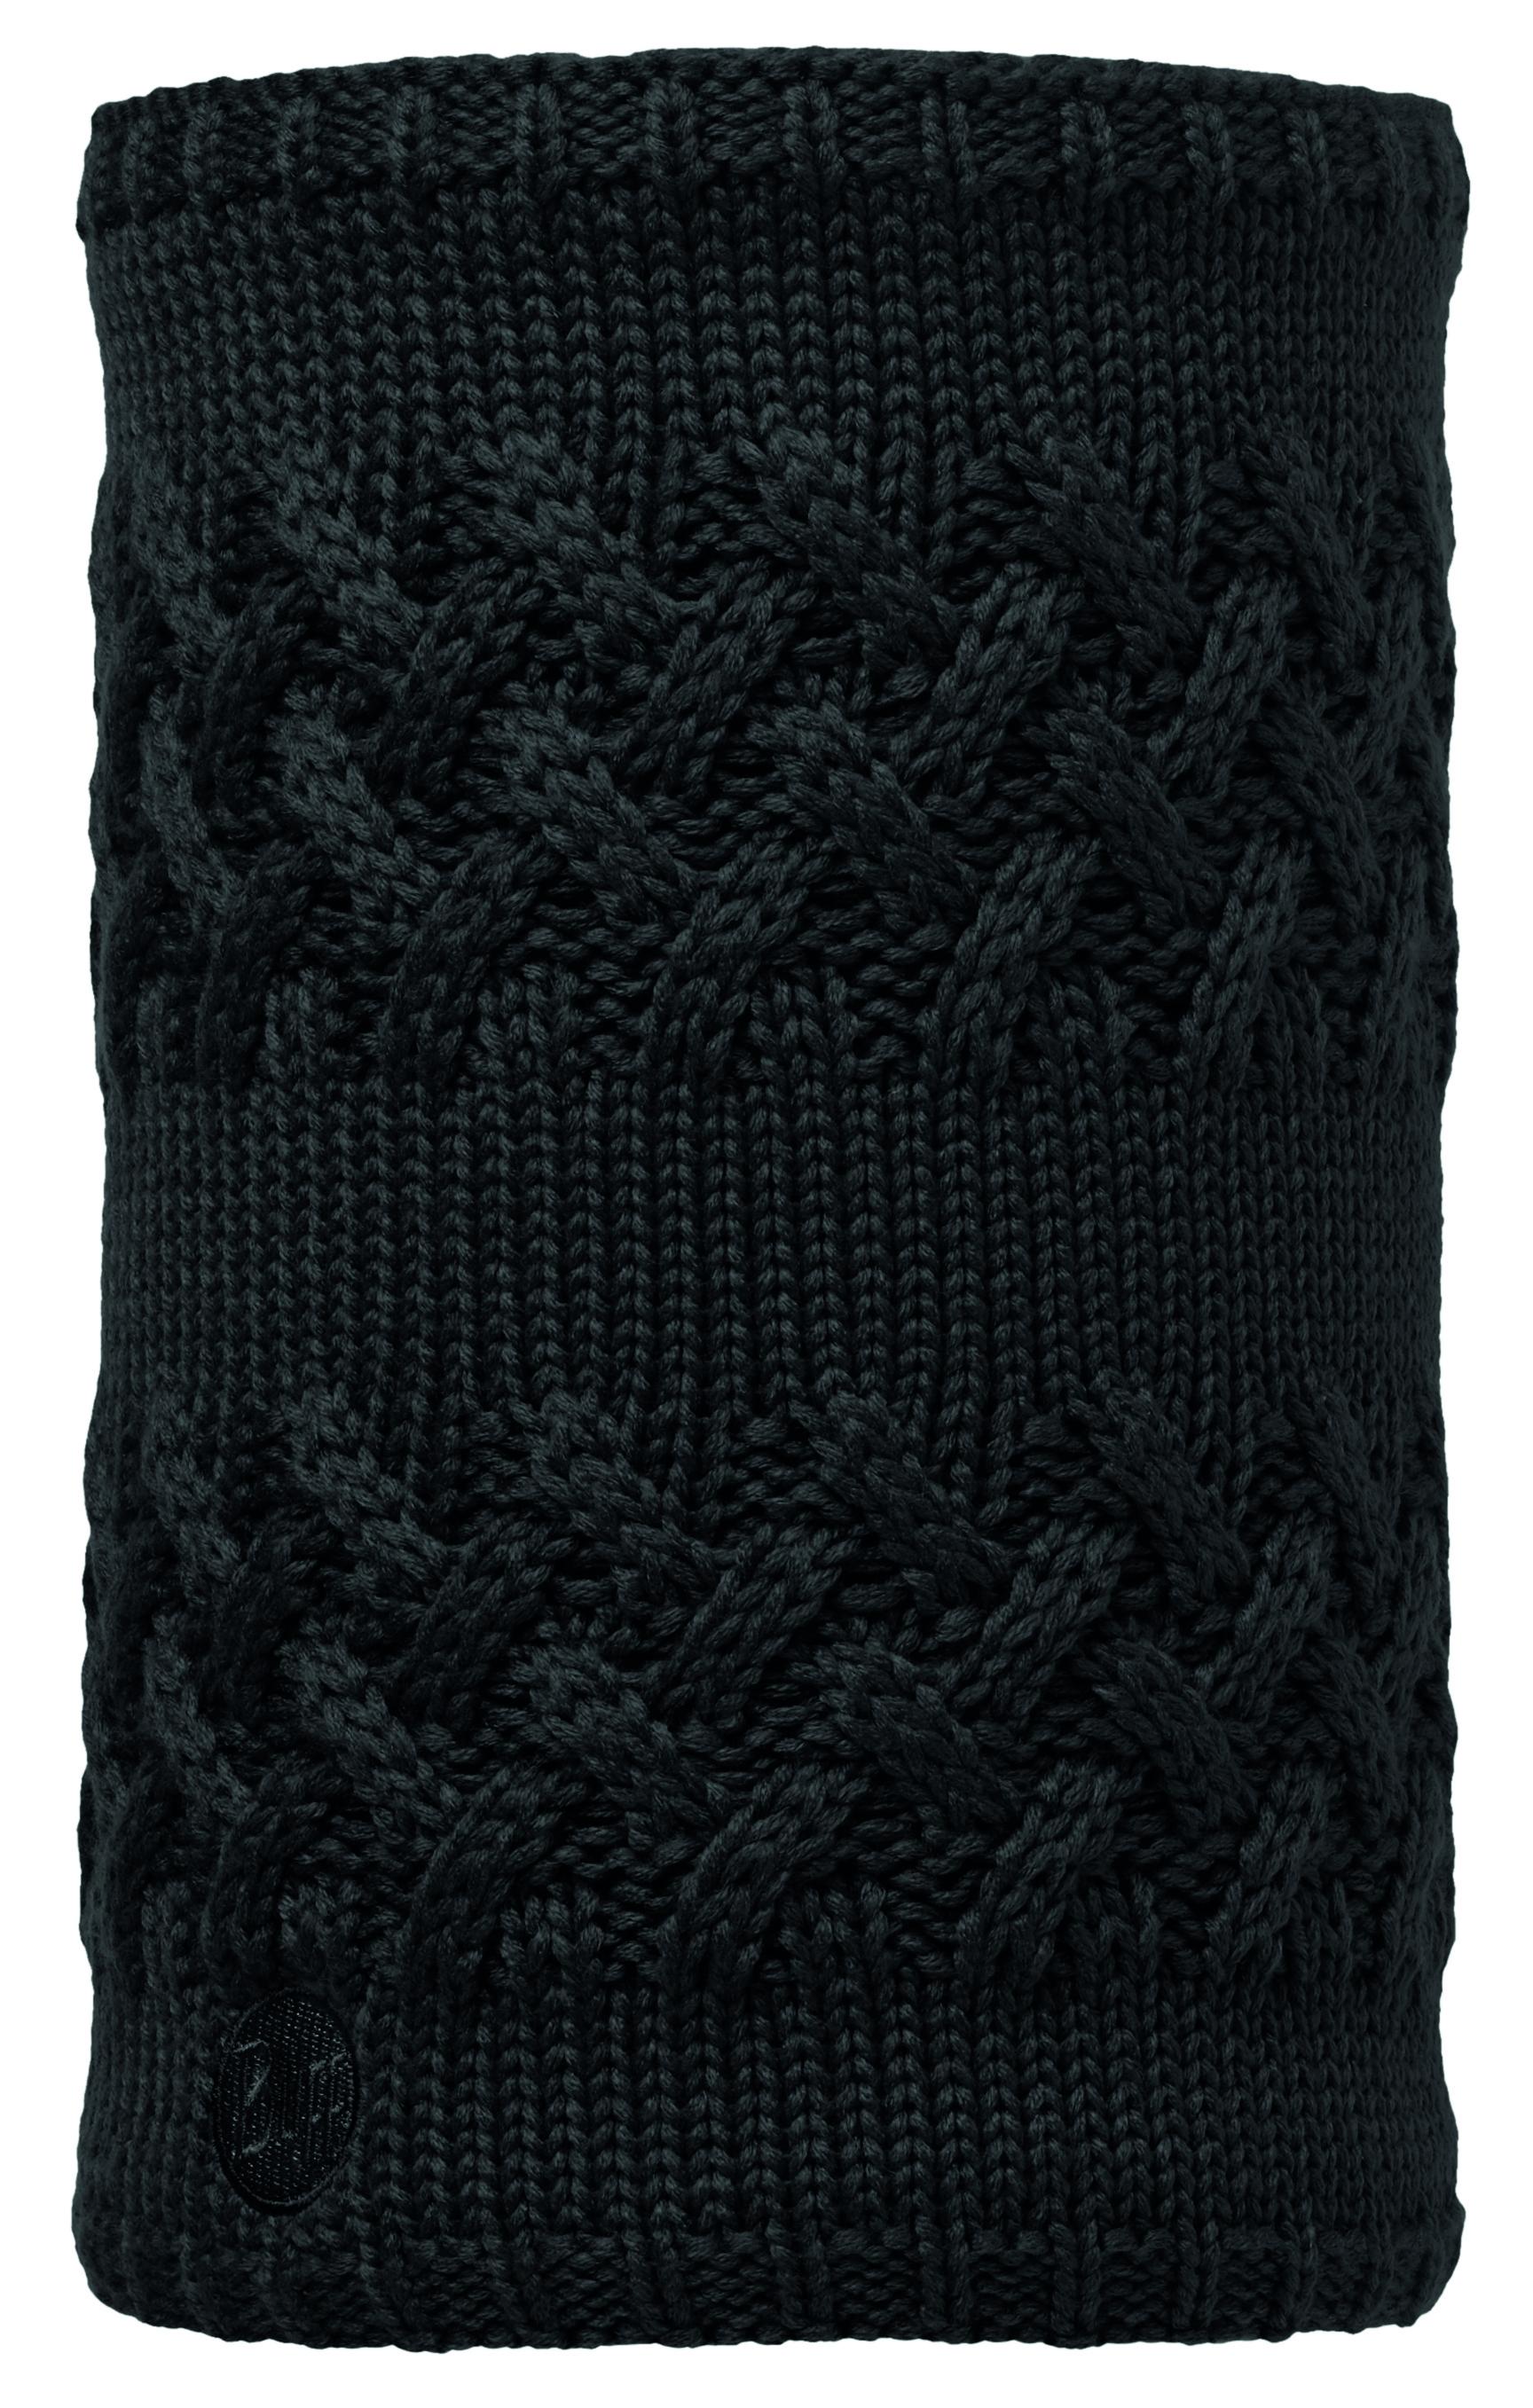 Шарф BUFF KNITTED & POLAR NECKWARMER SAVVA BLACK (US:one size)